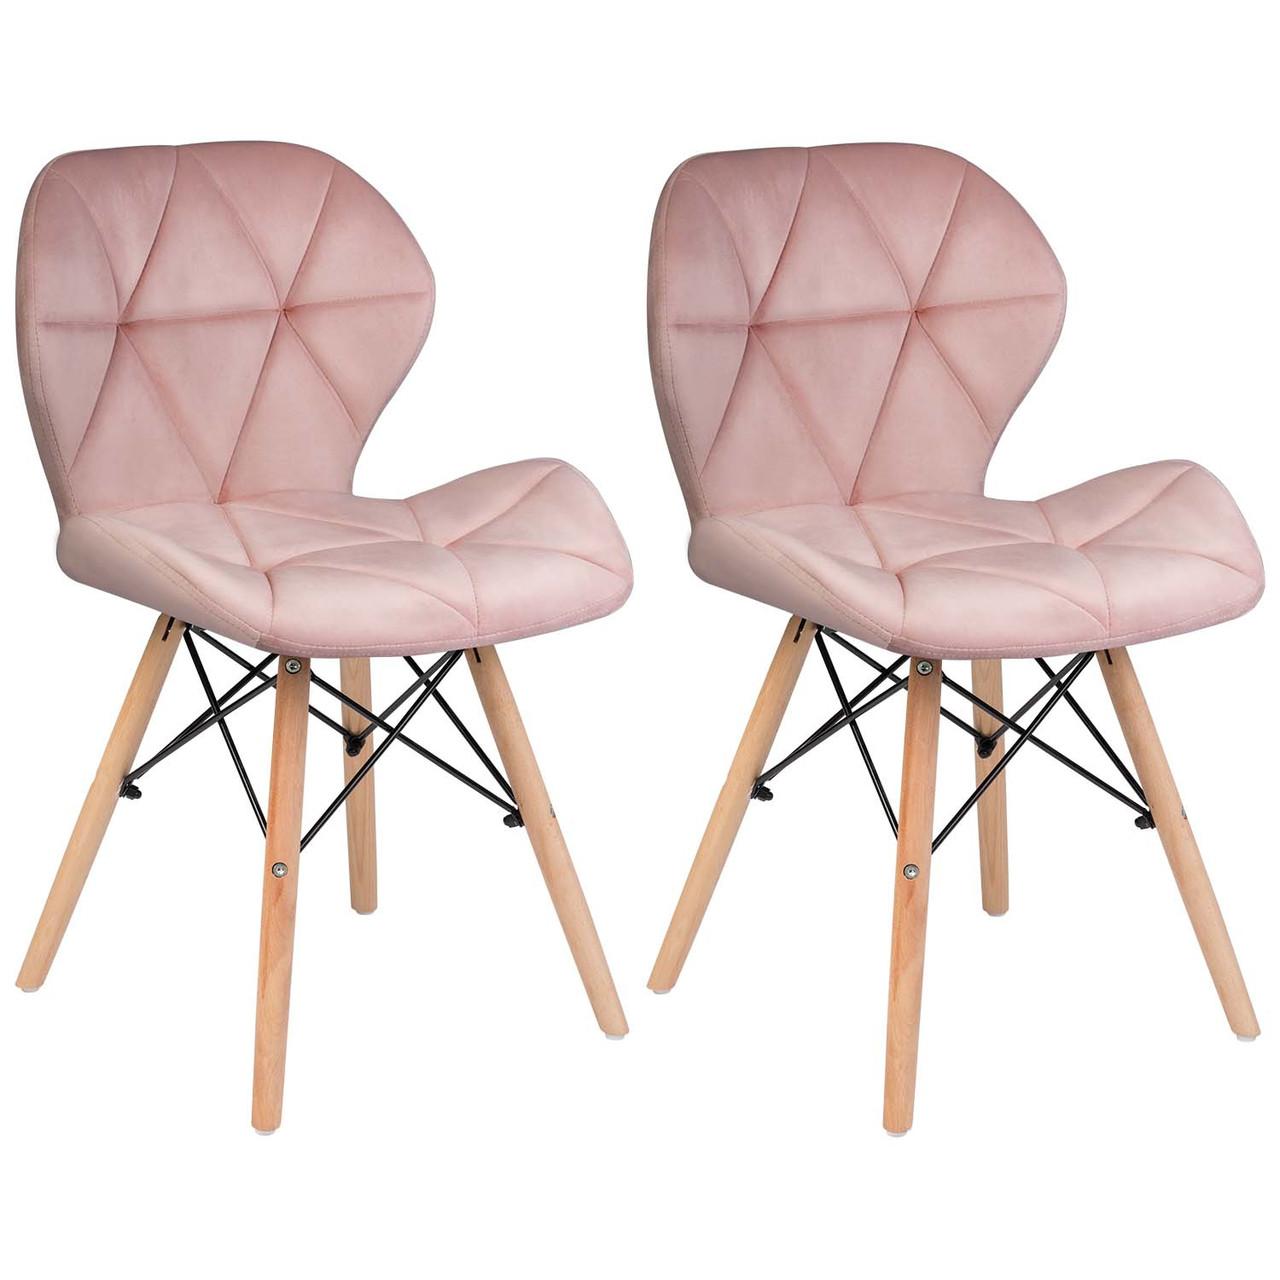 Сучасне велюрове скандинавське крісло Sofotel Sigma - рожеве 2 шт. Марка Європи